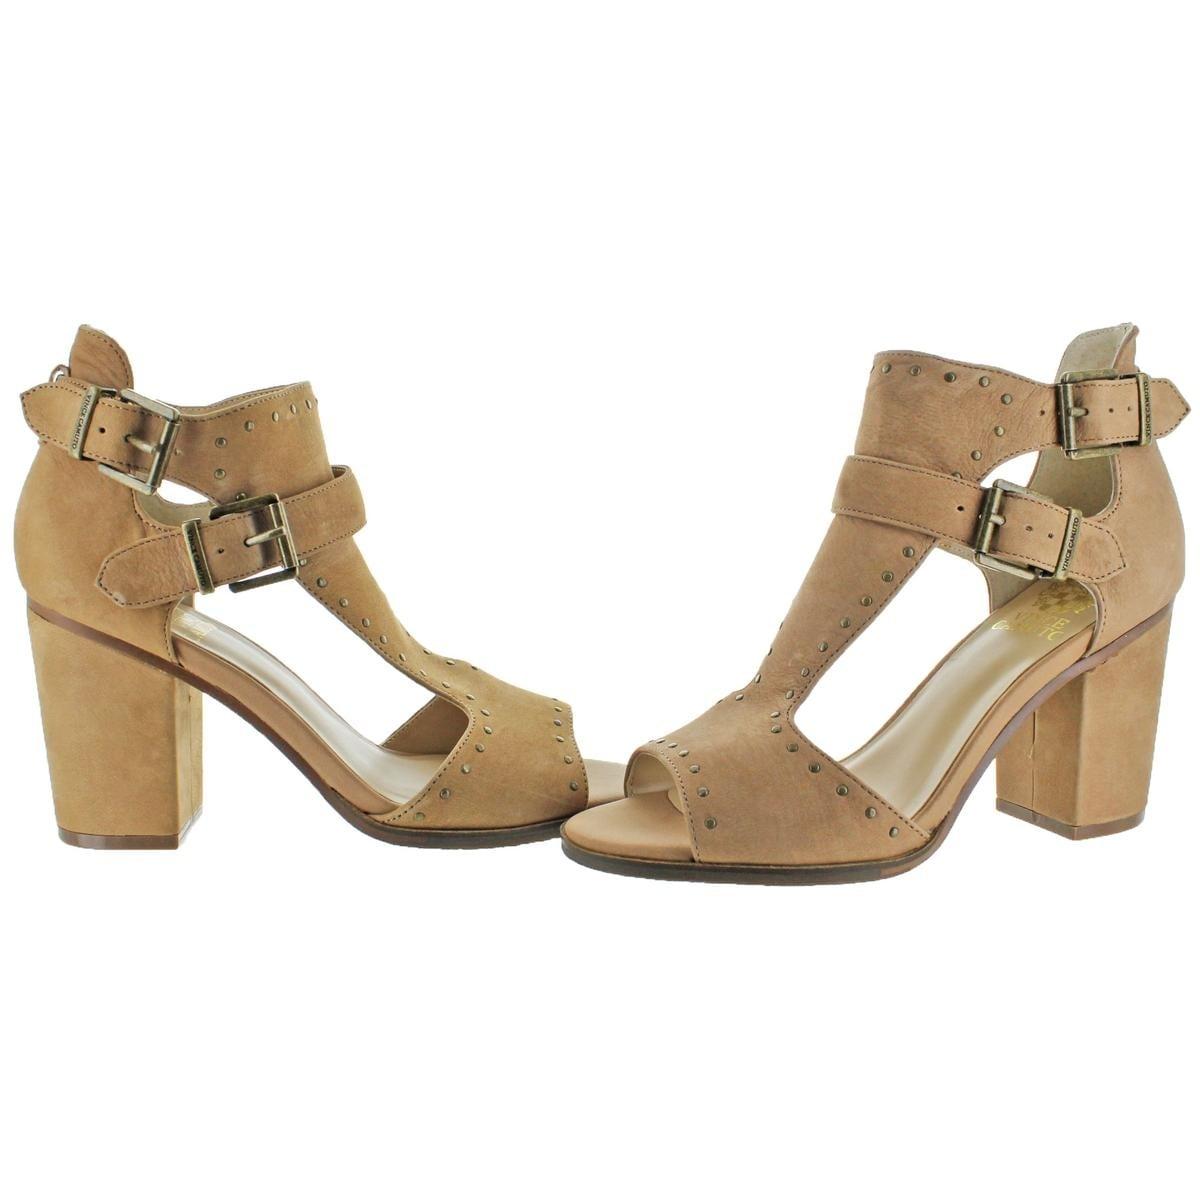 1be89ecdca4 Shop Vince Camuto Womens Jatola Heels Open Toe Block Heel - Free Shipping  On Orders Over  45 - Overstock - 20996980